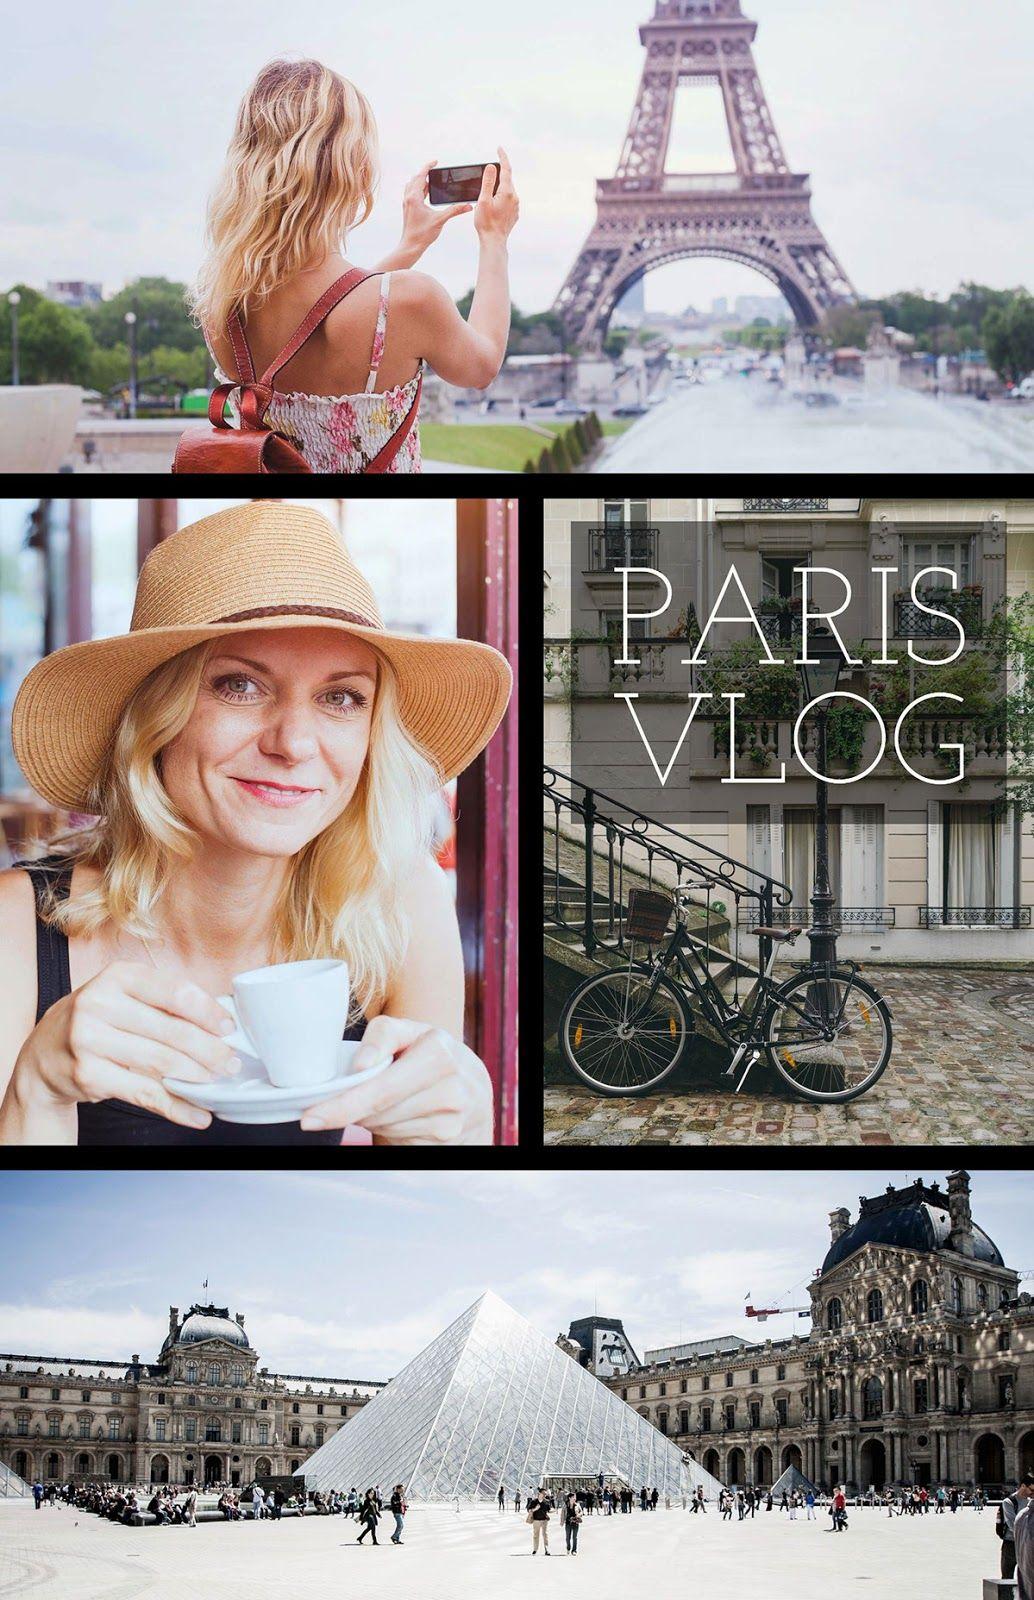 7 Best Free Online Photo Collage Maker Platforms